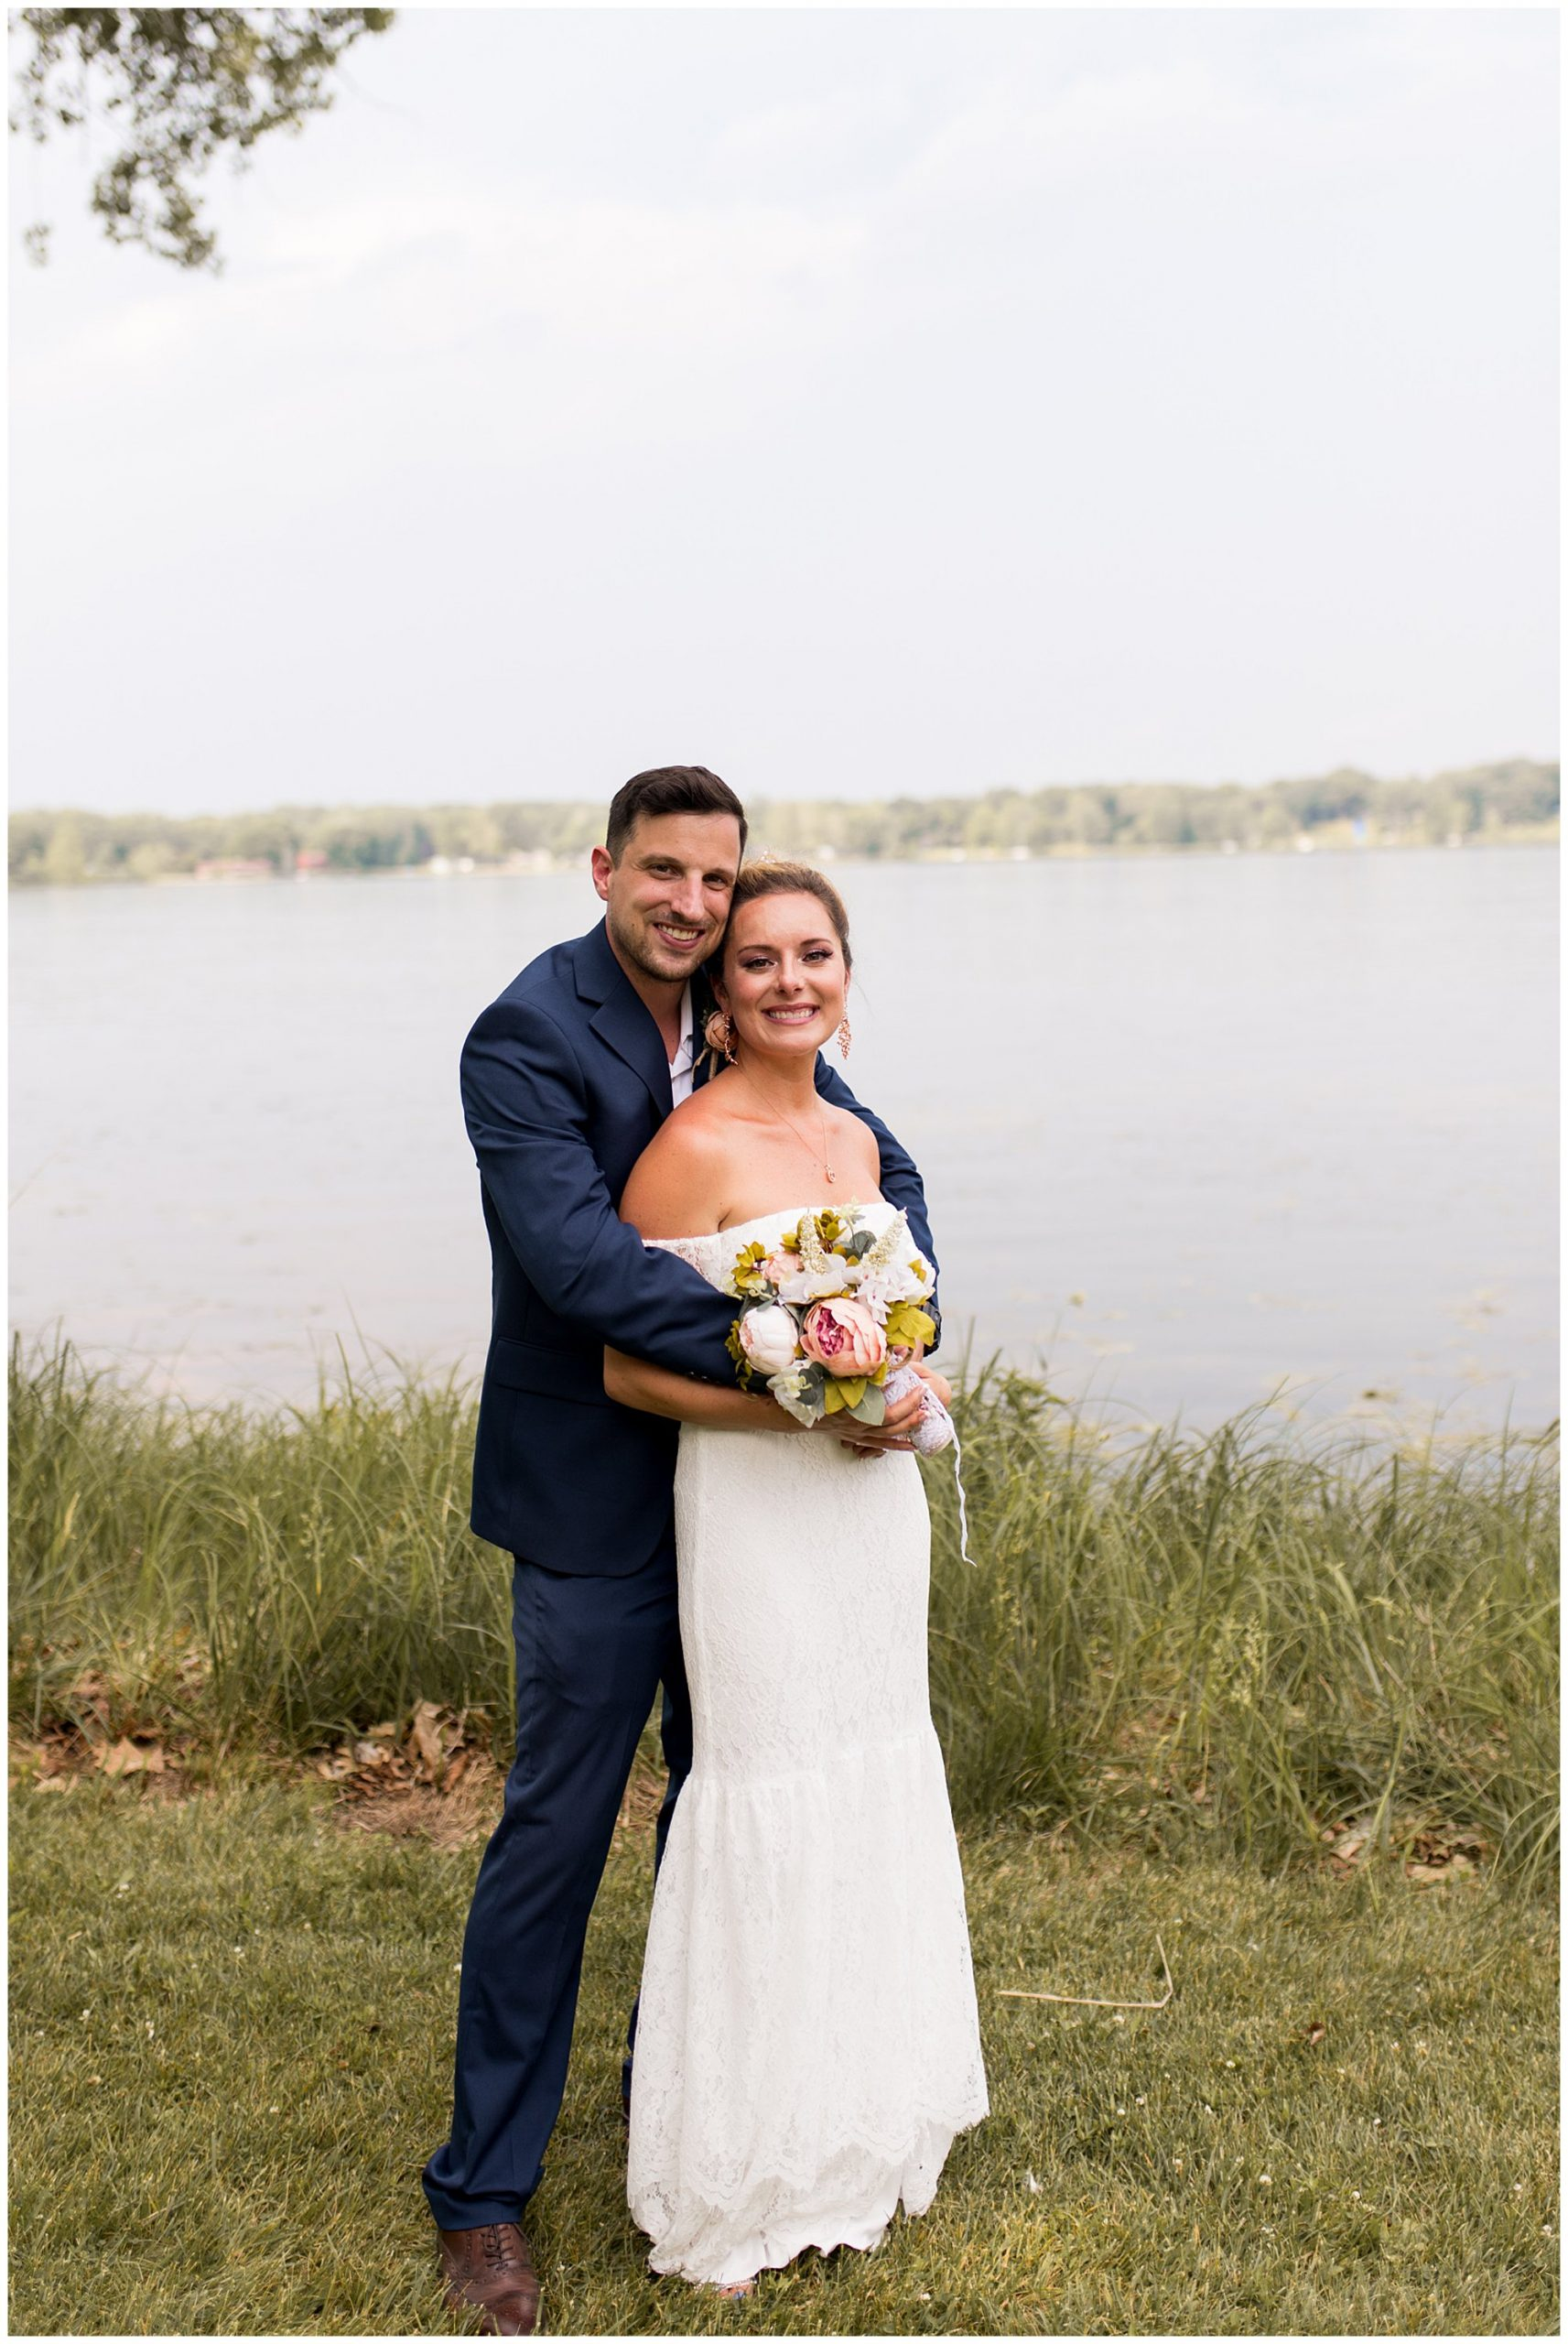 bride and groom after summer wedding at Lucerne Park in Warsaw, Indiana